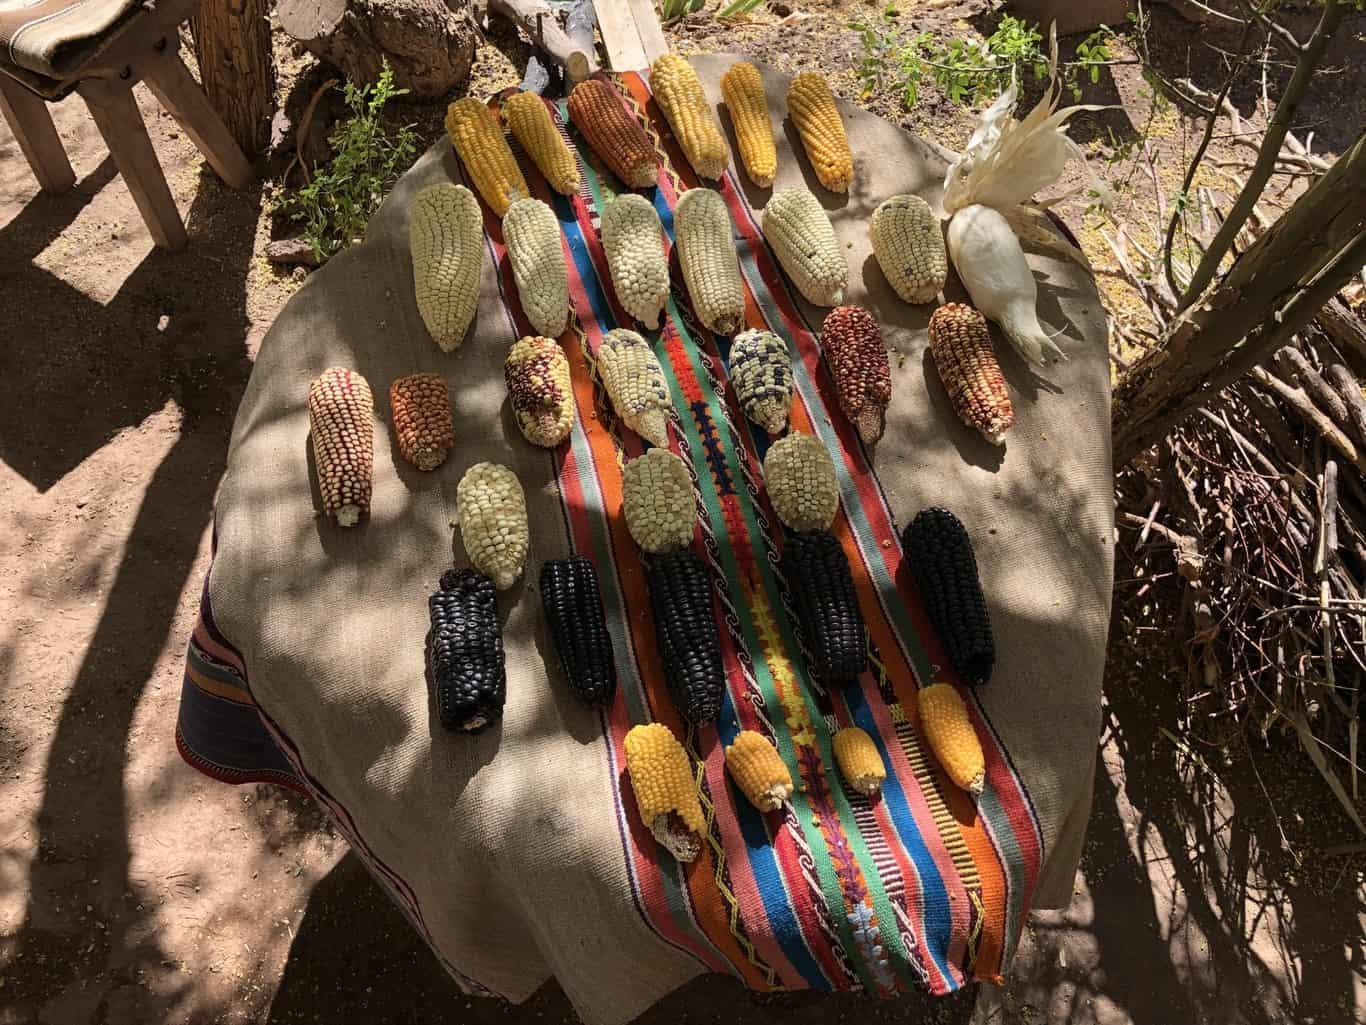 Day 1 - Los Ayllus ride - Encounter with Likan Antai Indigenous community